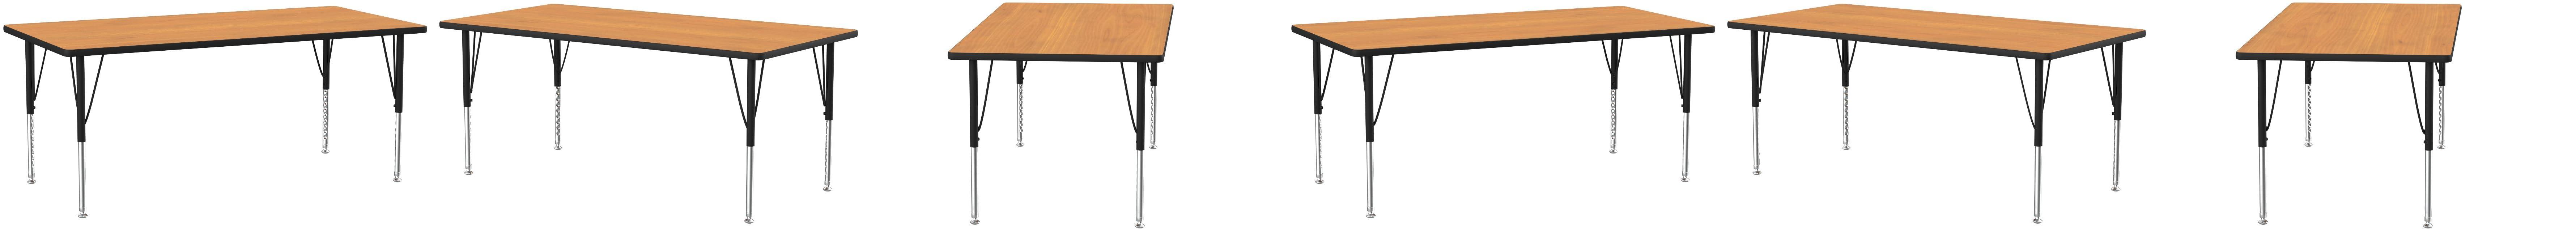 Amazon Com Flash Furniture 24 W X 48 L Rectangular Oak Thermal Laminate Activity Table Height Adjustable Short Legs Furniture Decor